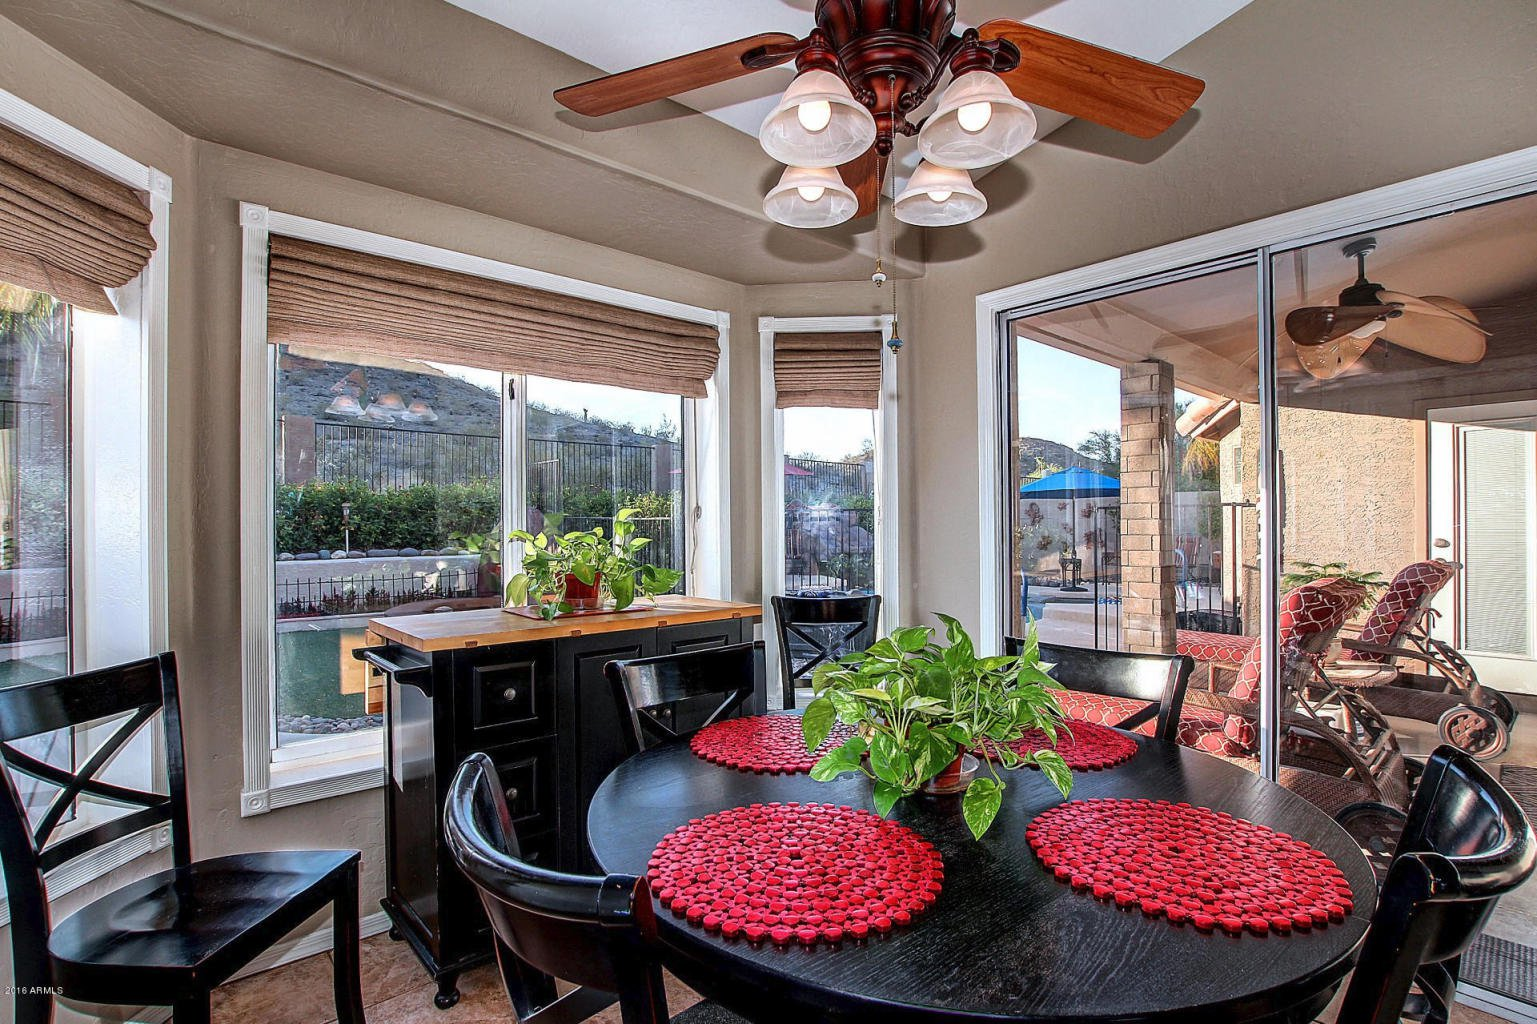 Photo 14: Photos: 3602 E Mountain Sky Avenue in Phoenix: Ahwatukee House for sale : MLS®# 5462780